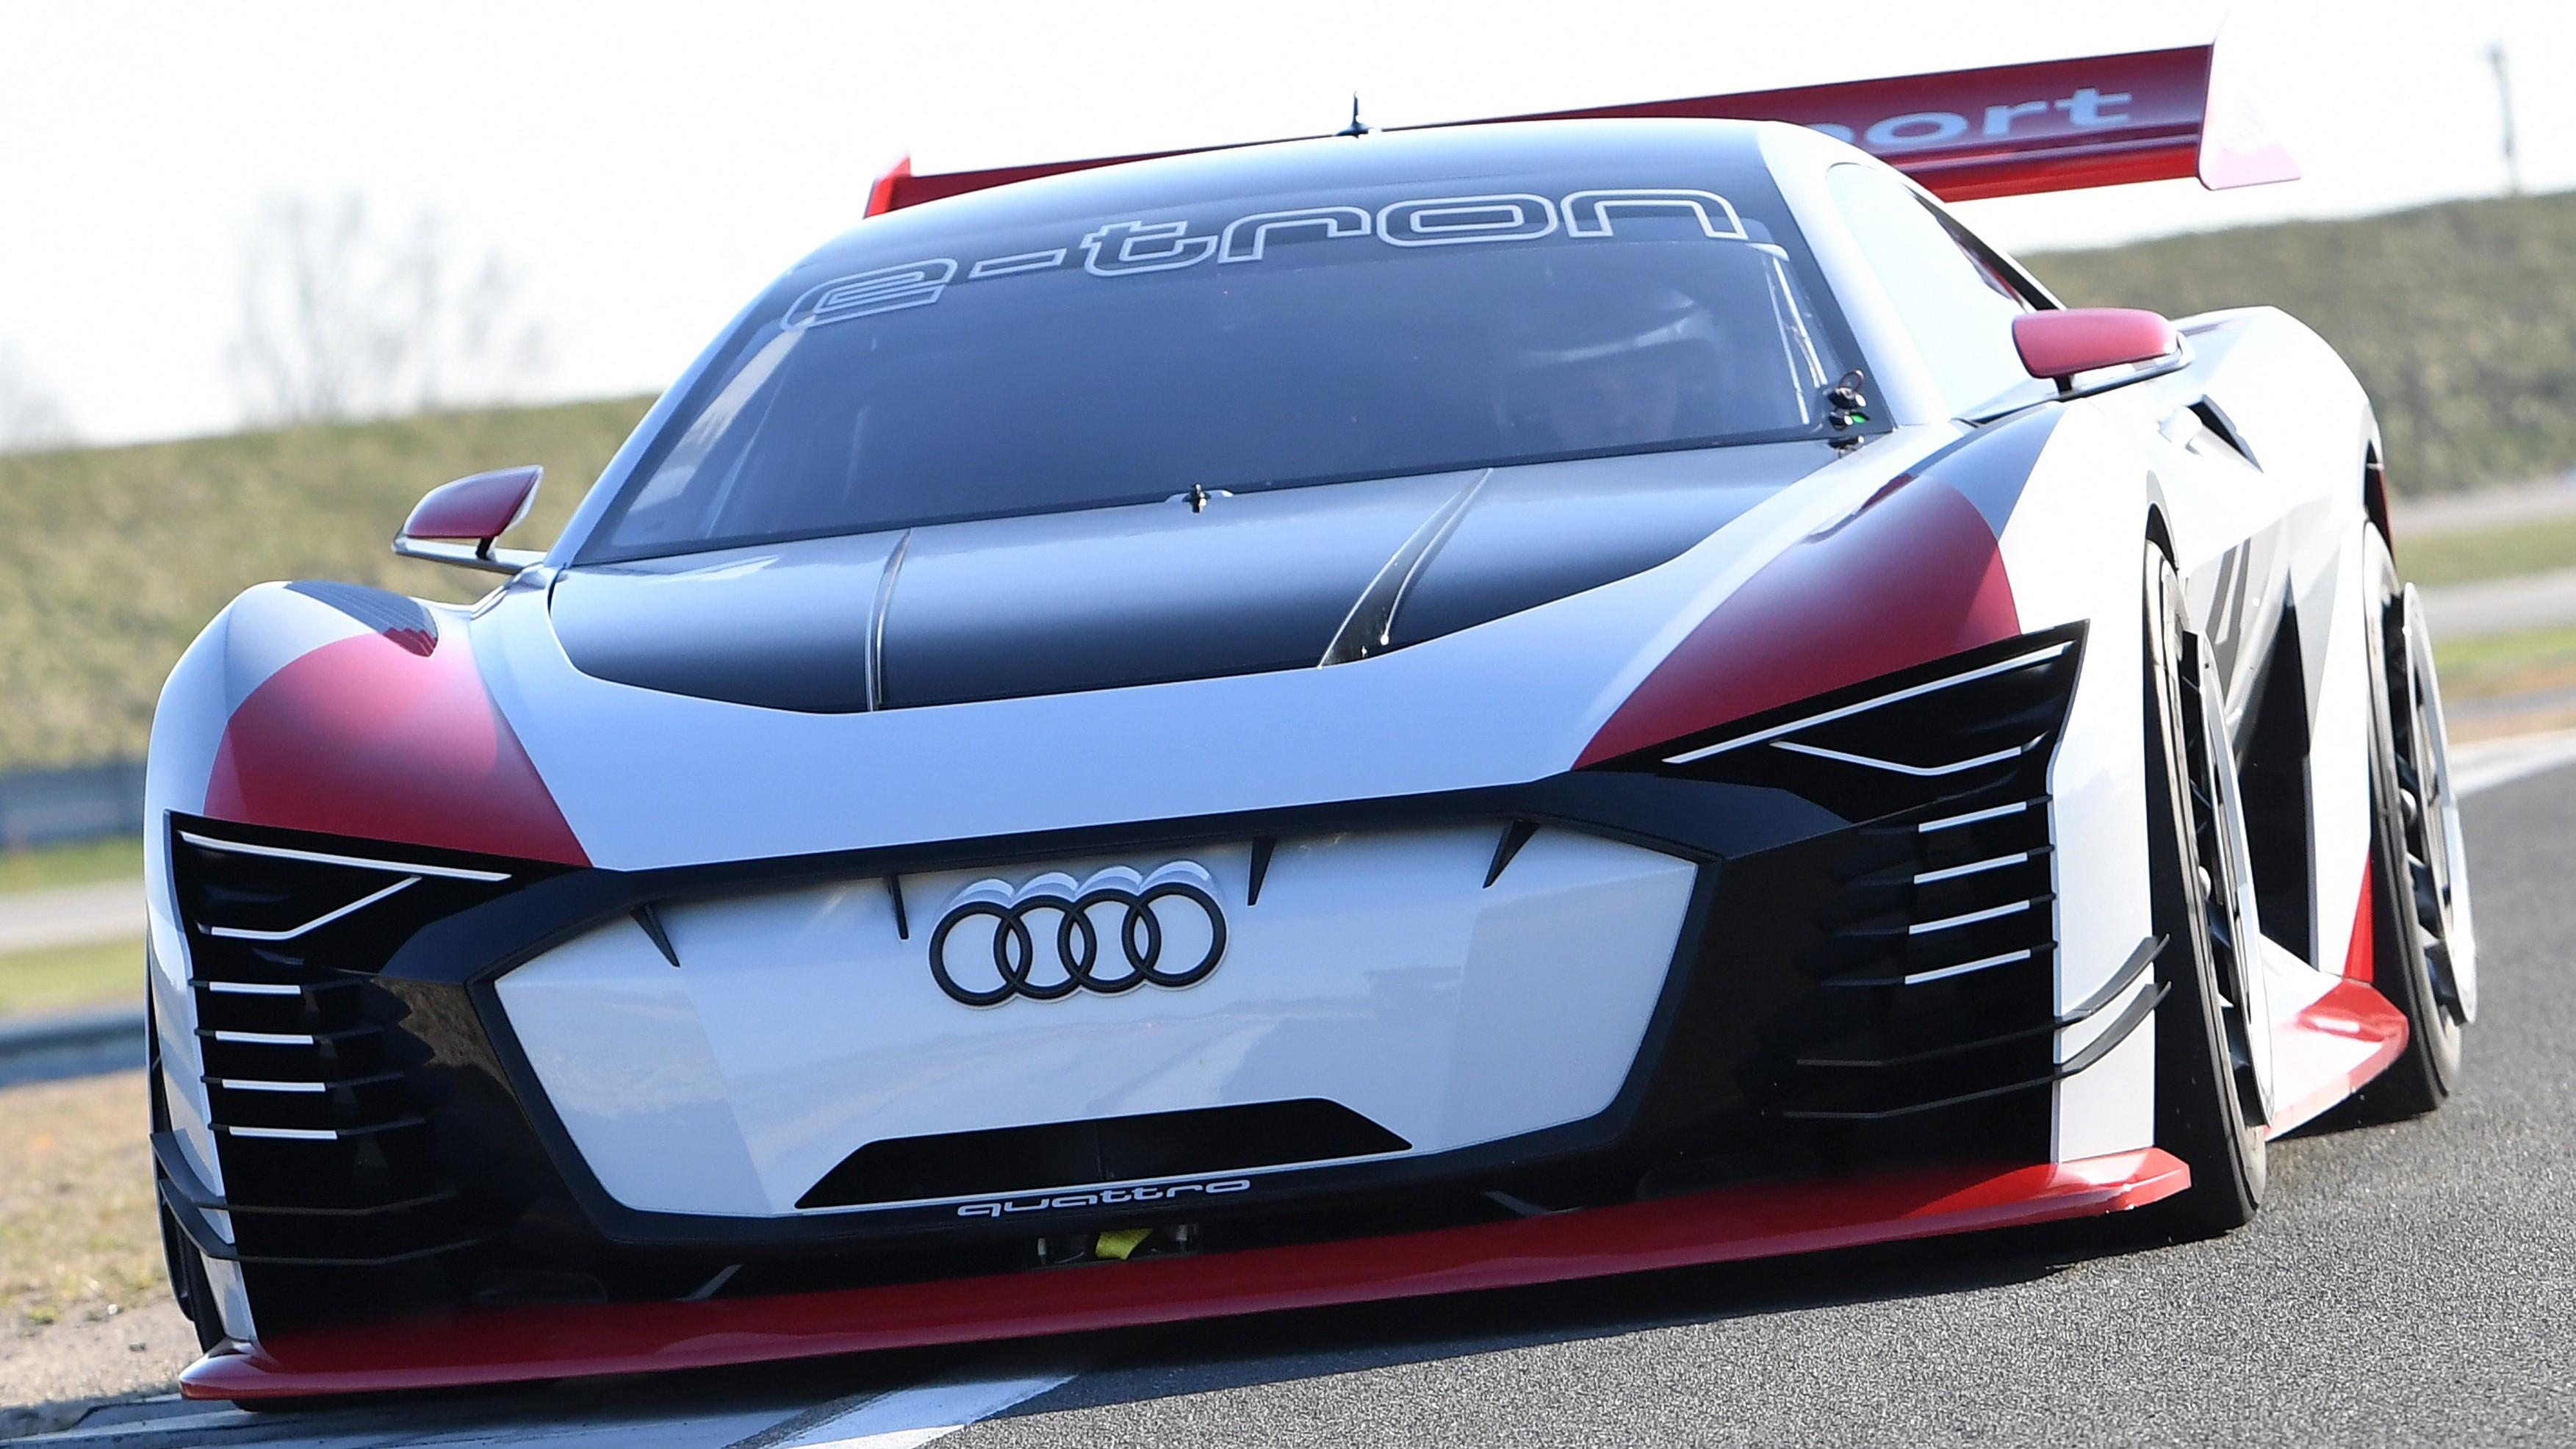 Audi e-tron Vision Gran Turismo first drive review